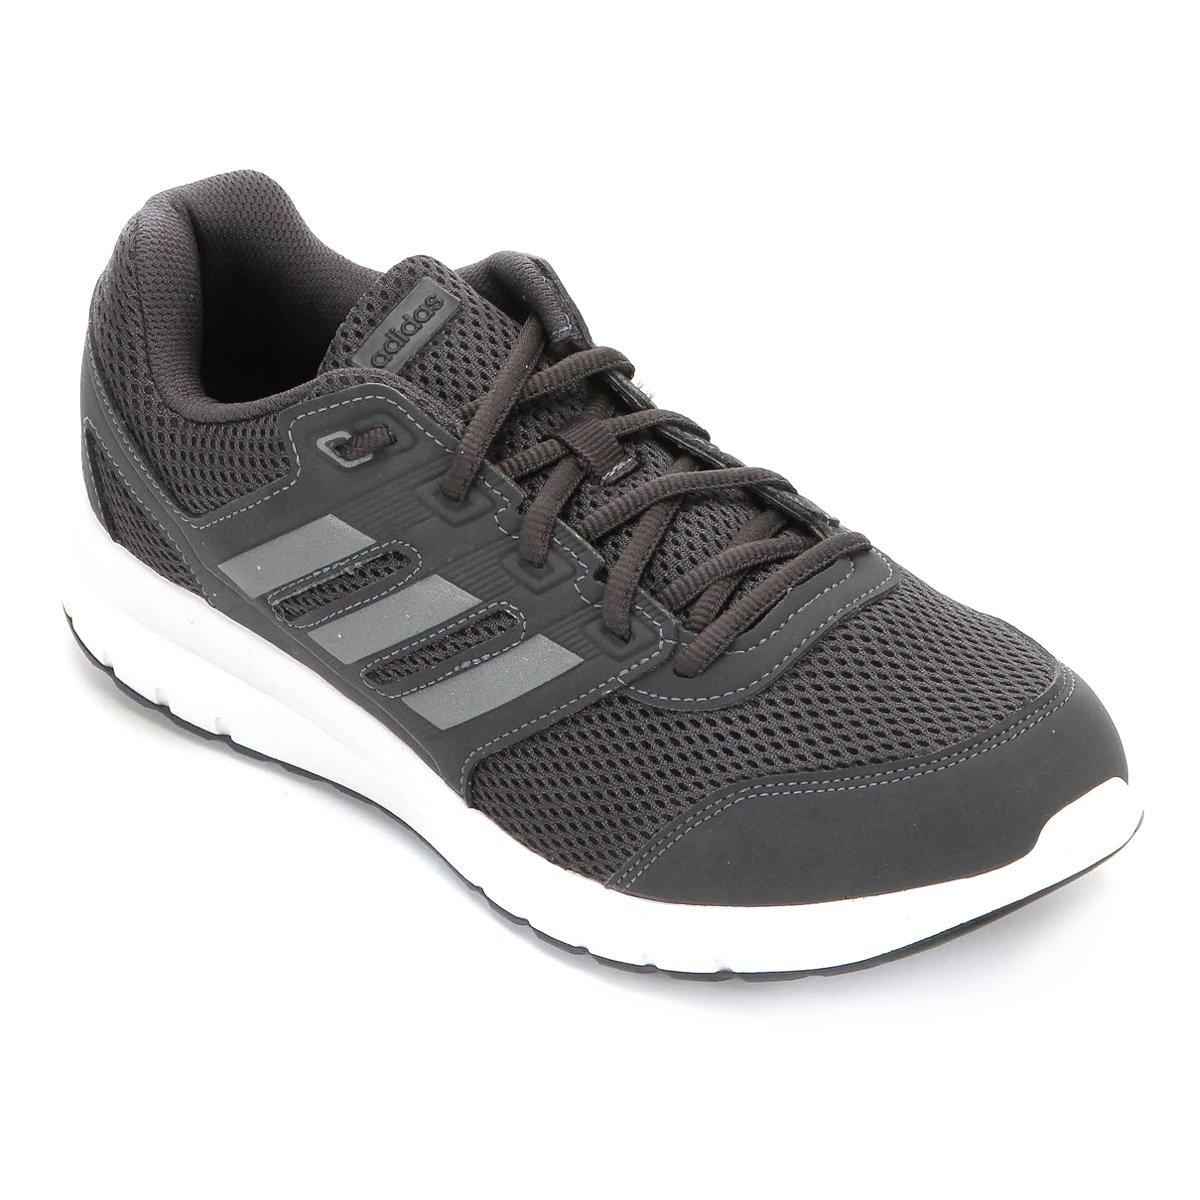 Tênis Adidas Duramo Lite 2 0 Masculino - Cinza e Preto - Compre ... df70cc203a5d1